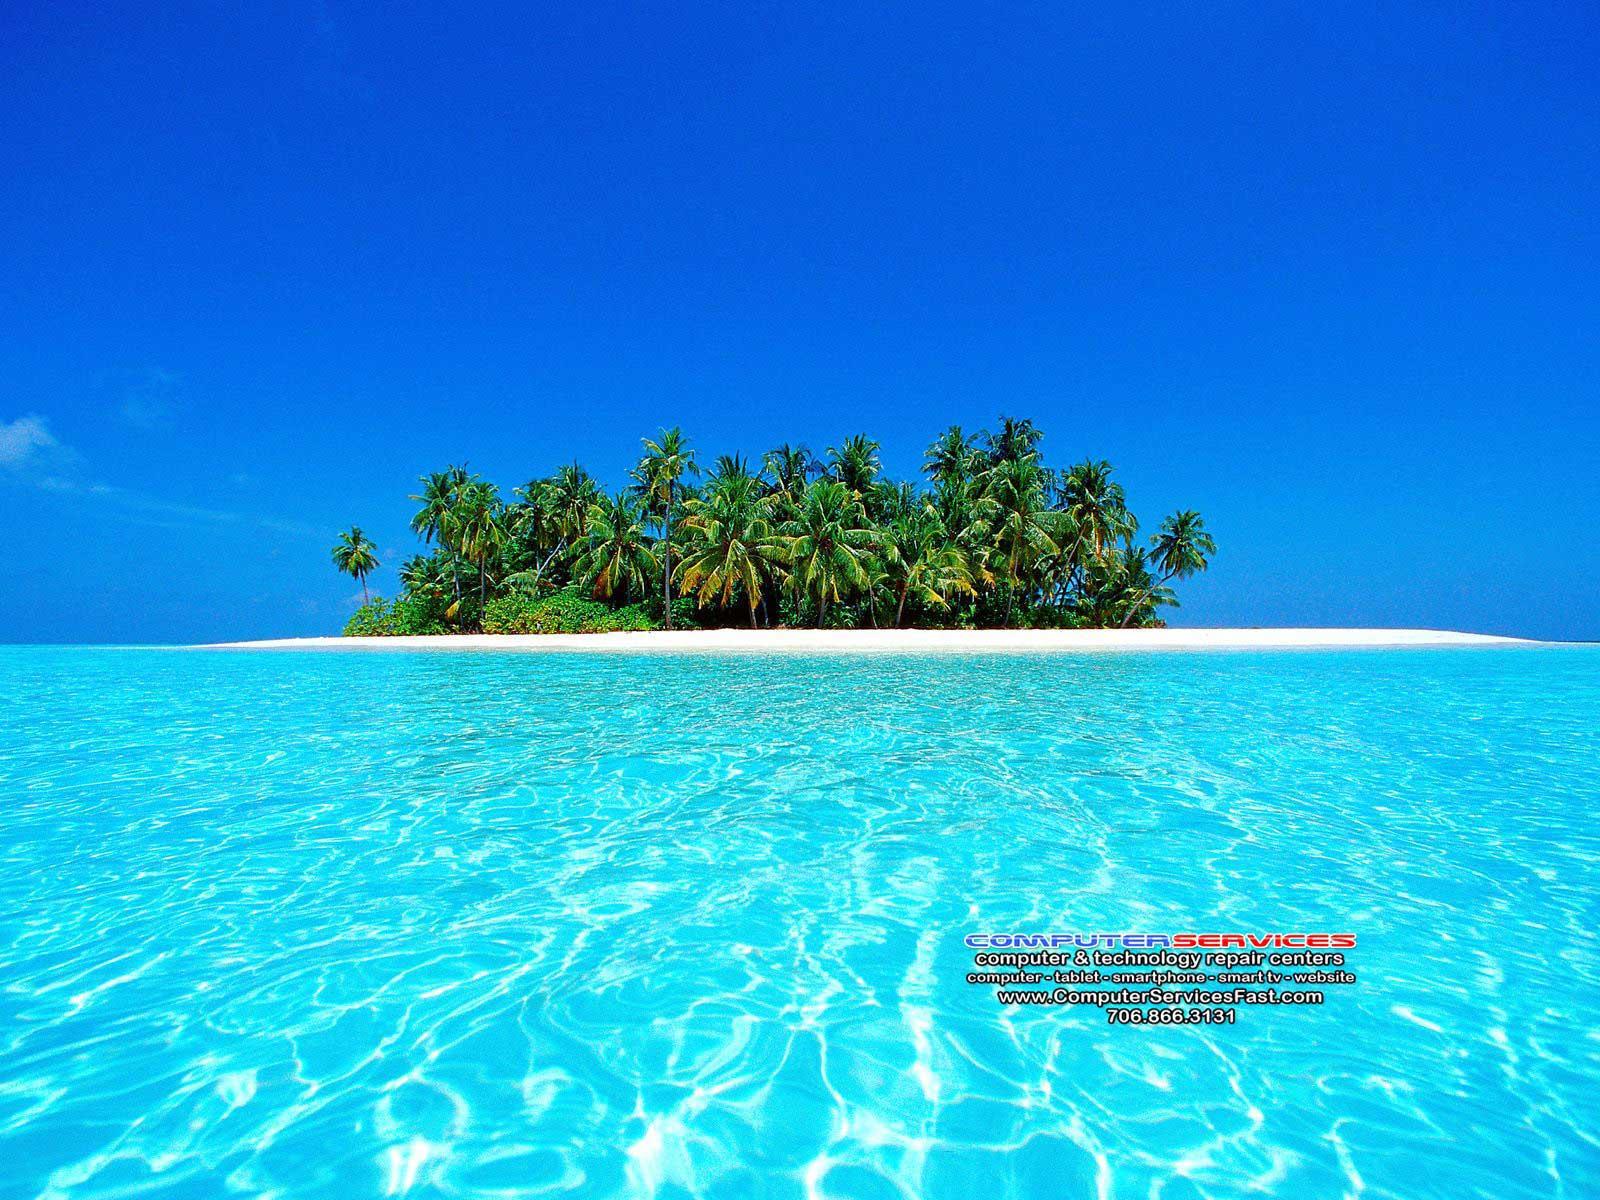 island-bkgnd